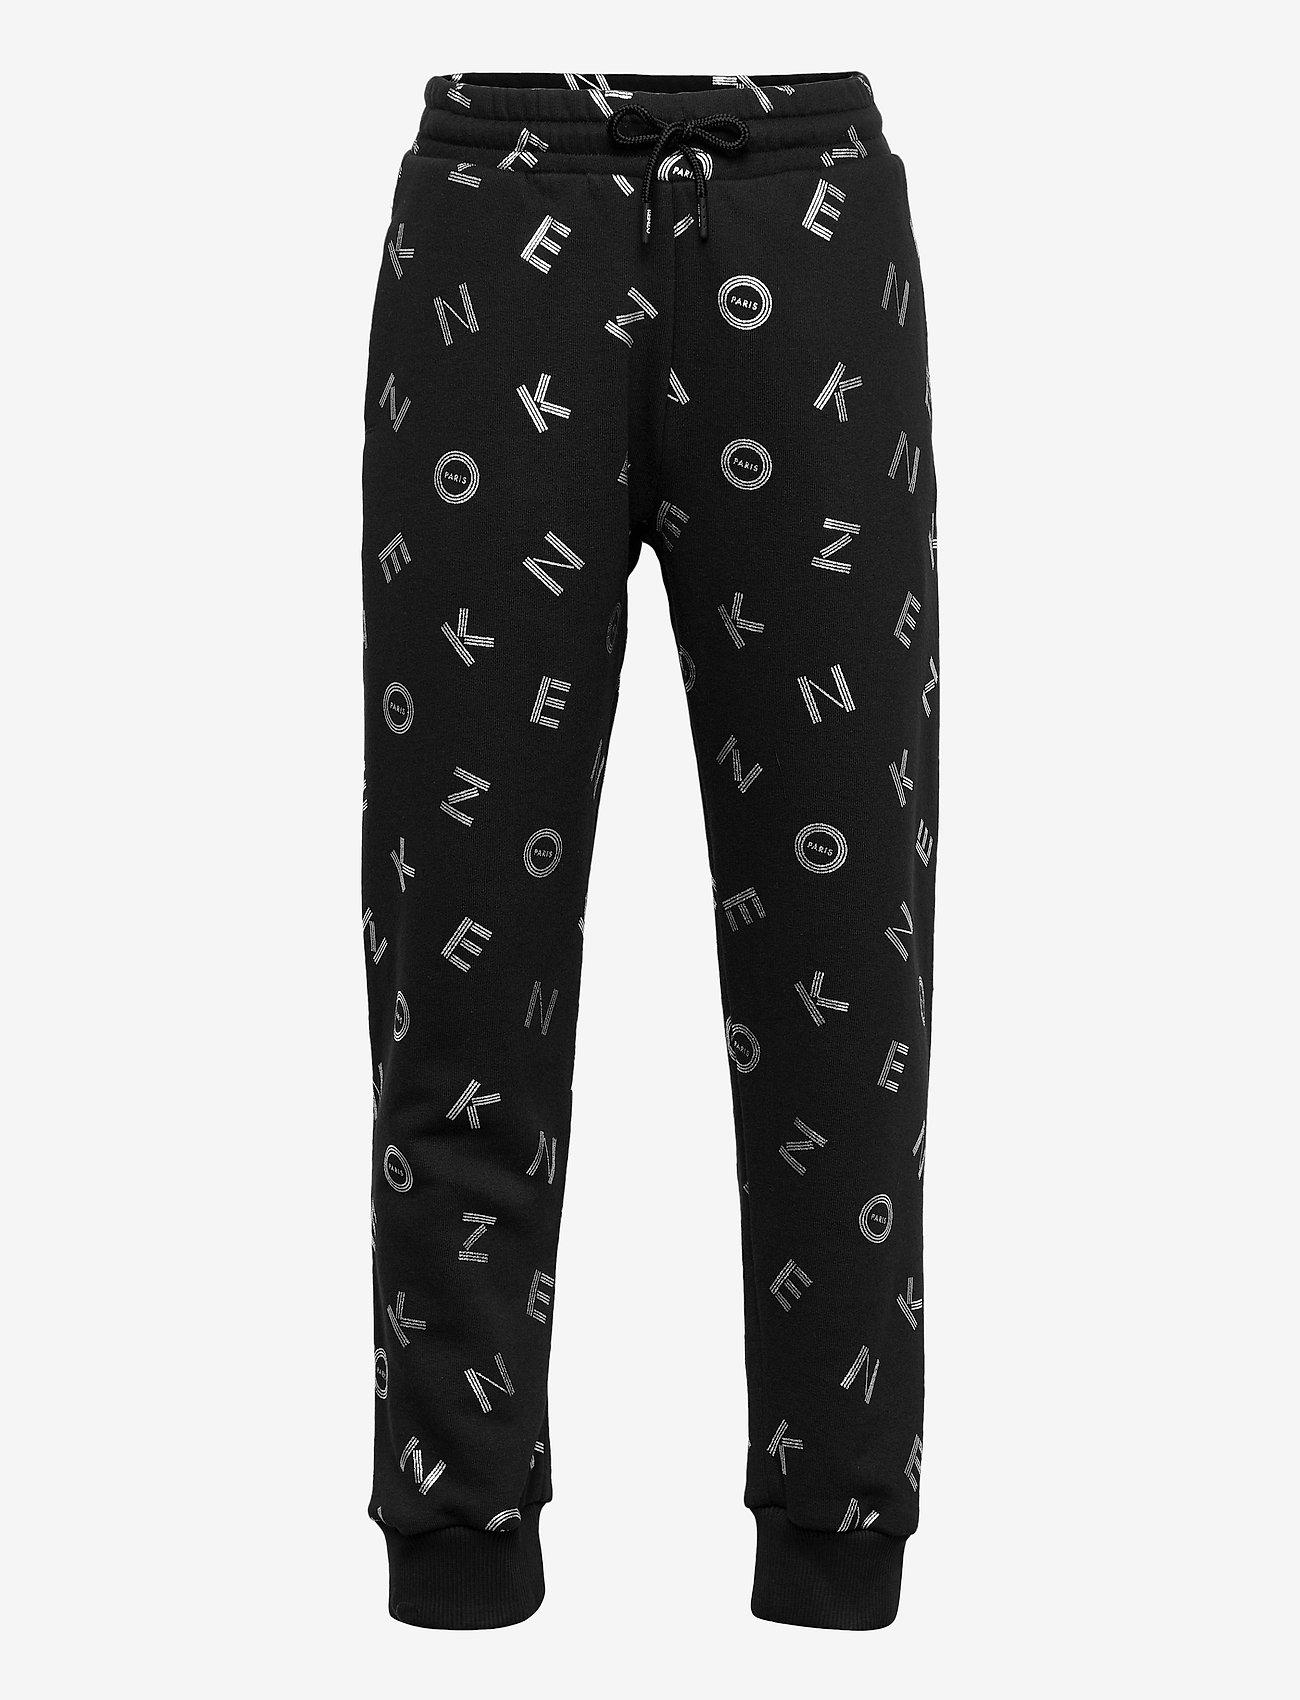 Kenzo - TROUSERS - trousers - black - 0